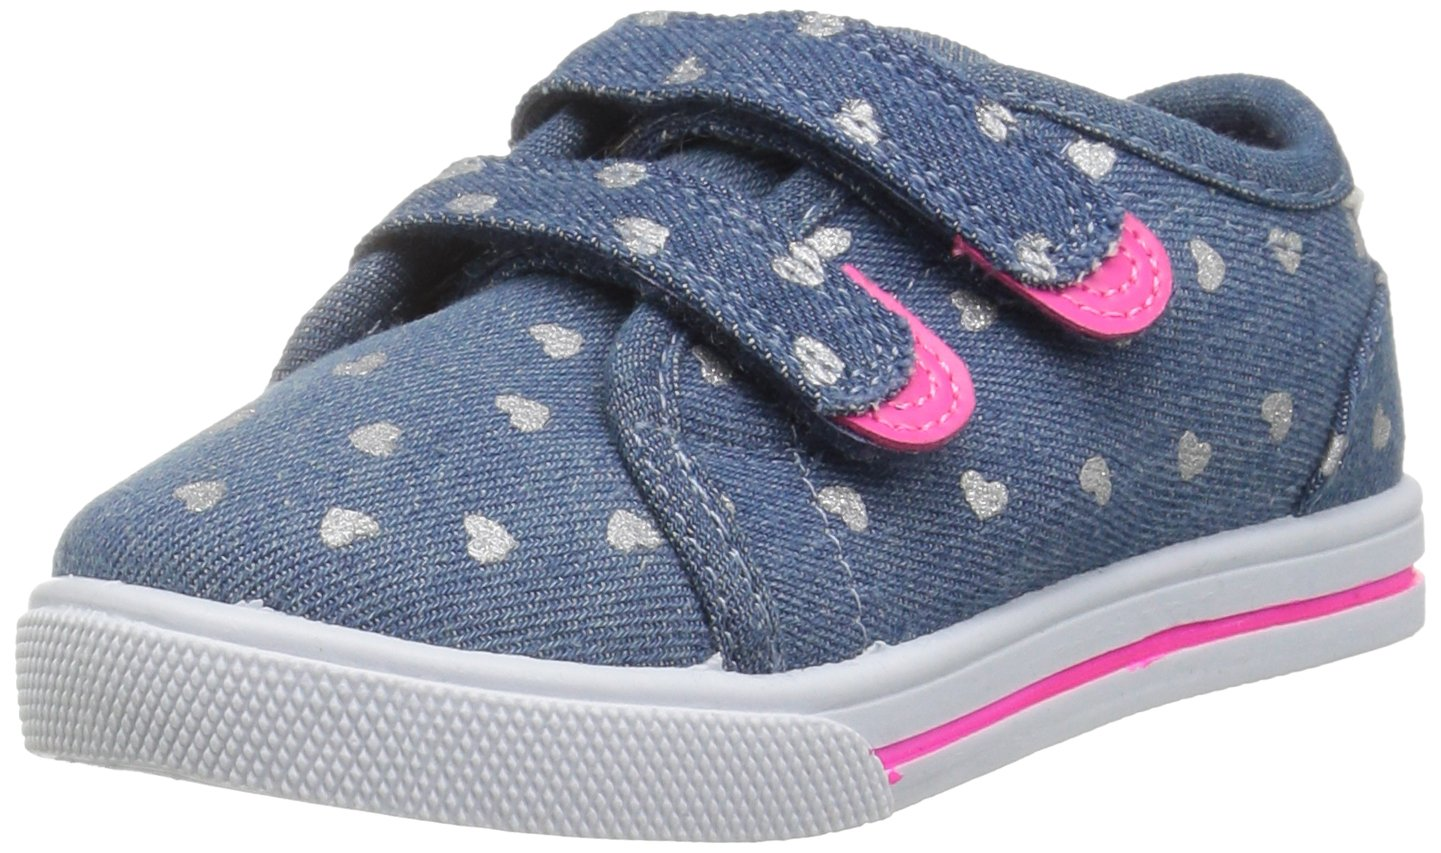 Carter's Girls' Nikki2 Casual Sneaker, Blue, 11 M US Little Kid